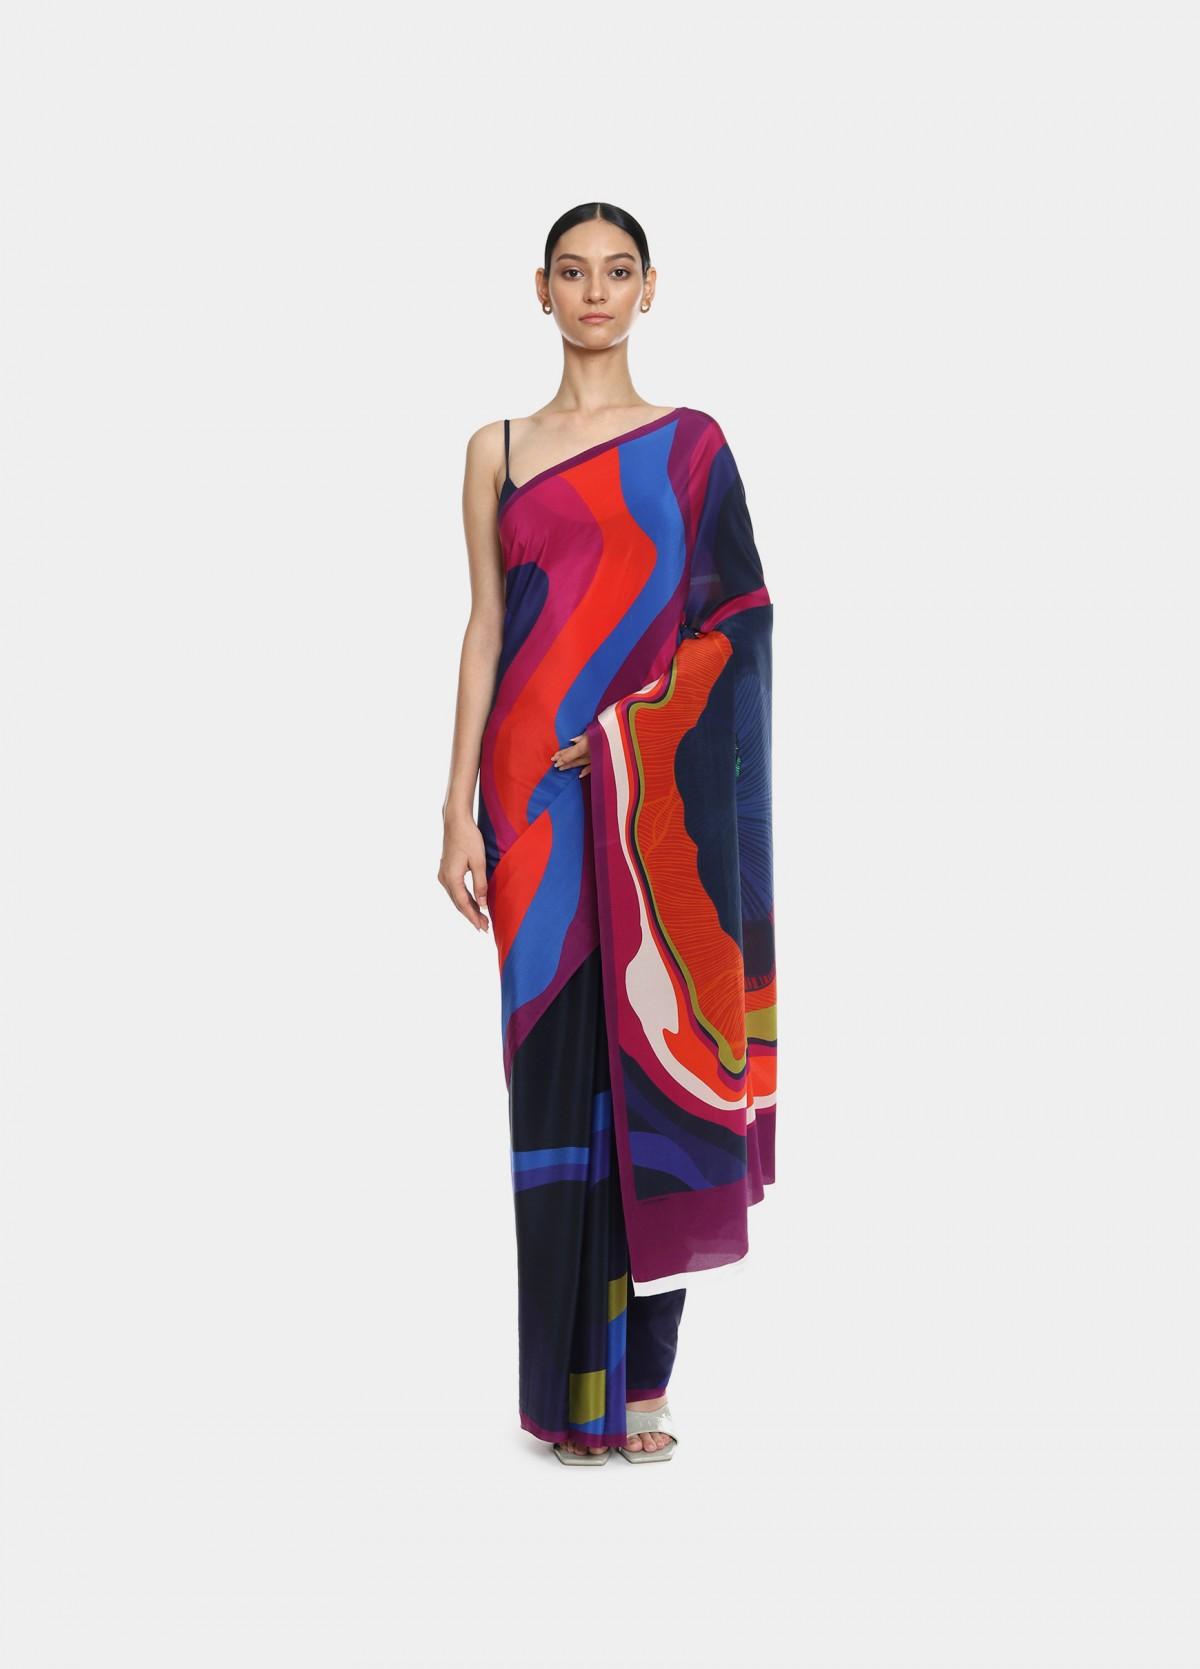 The Stayin' Alive Sari